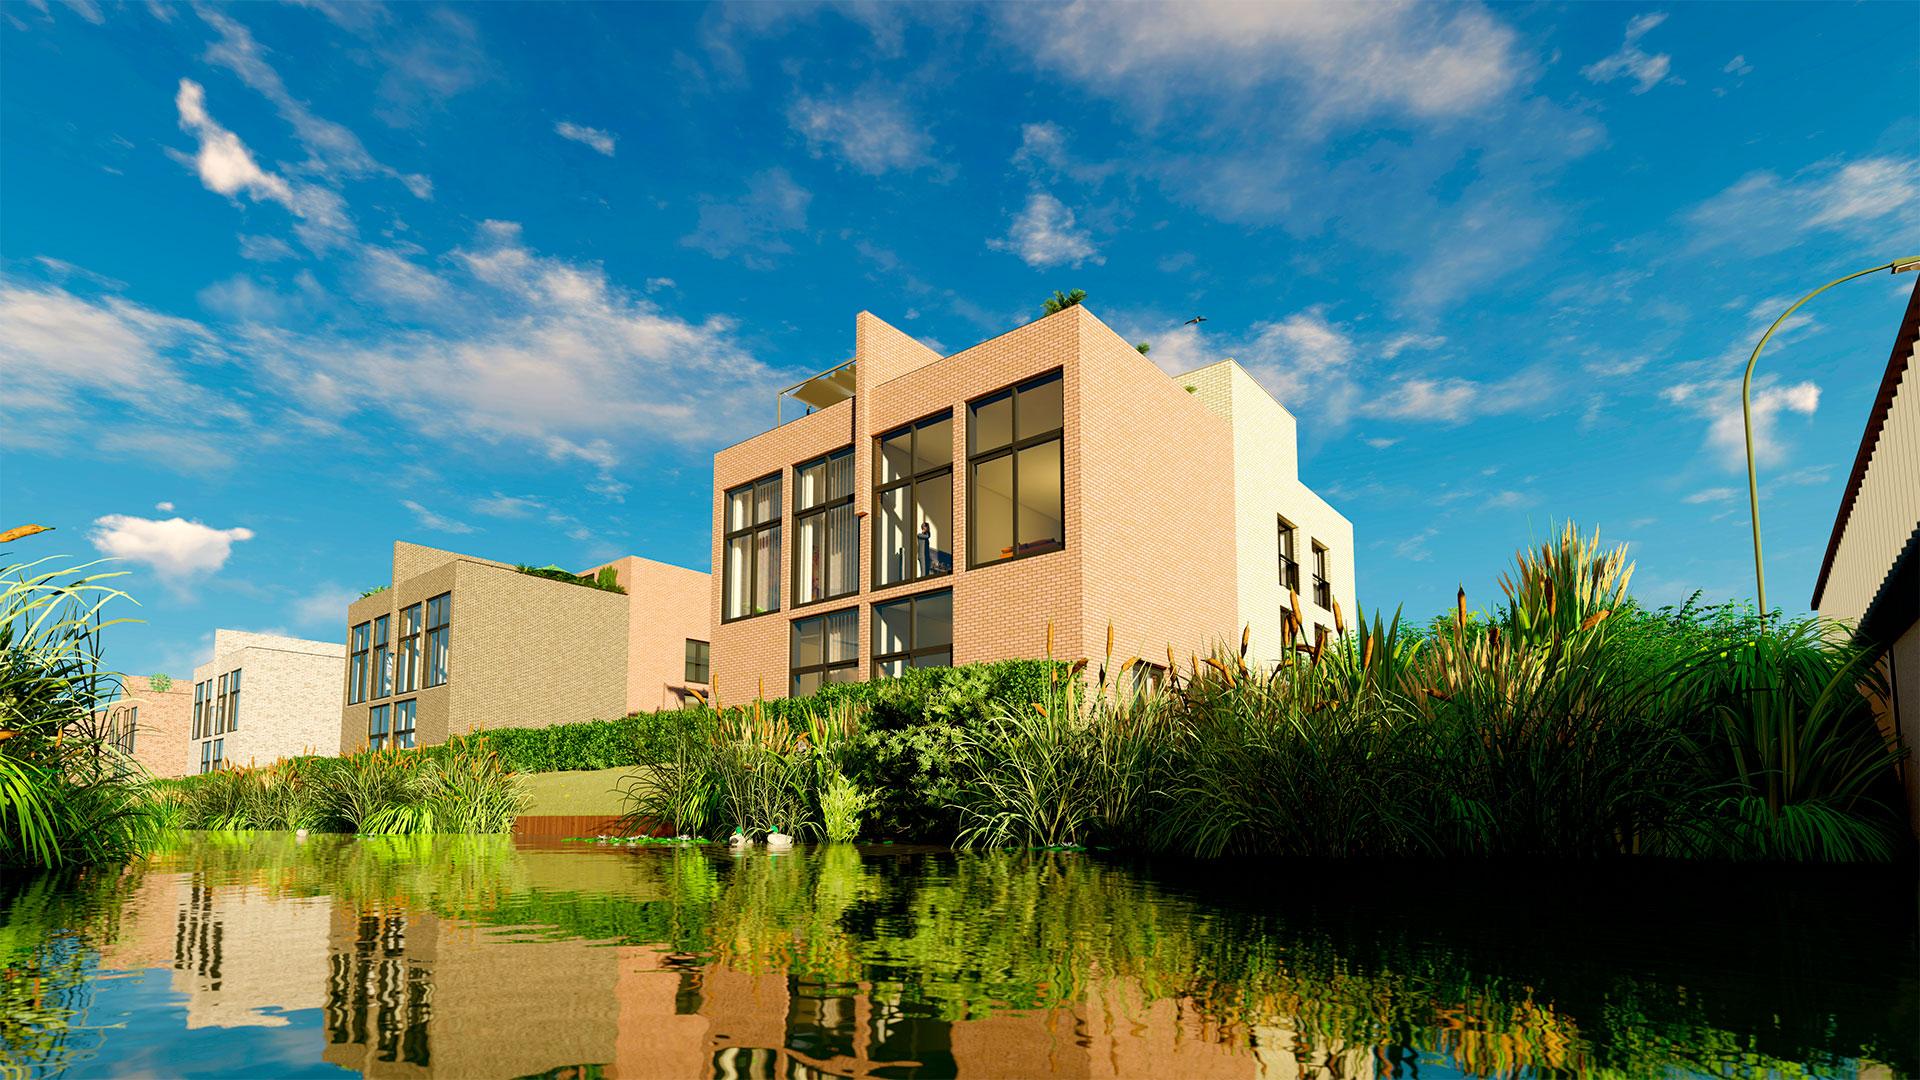 nexis-urban-villas-achterzijde.jpg